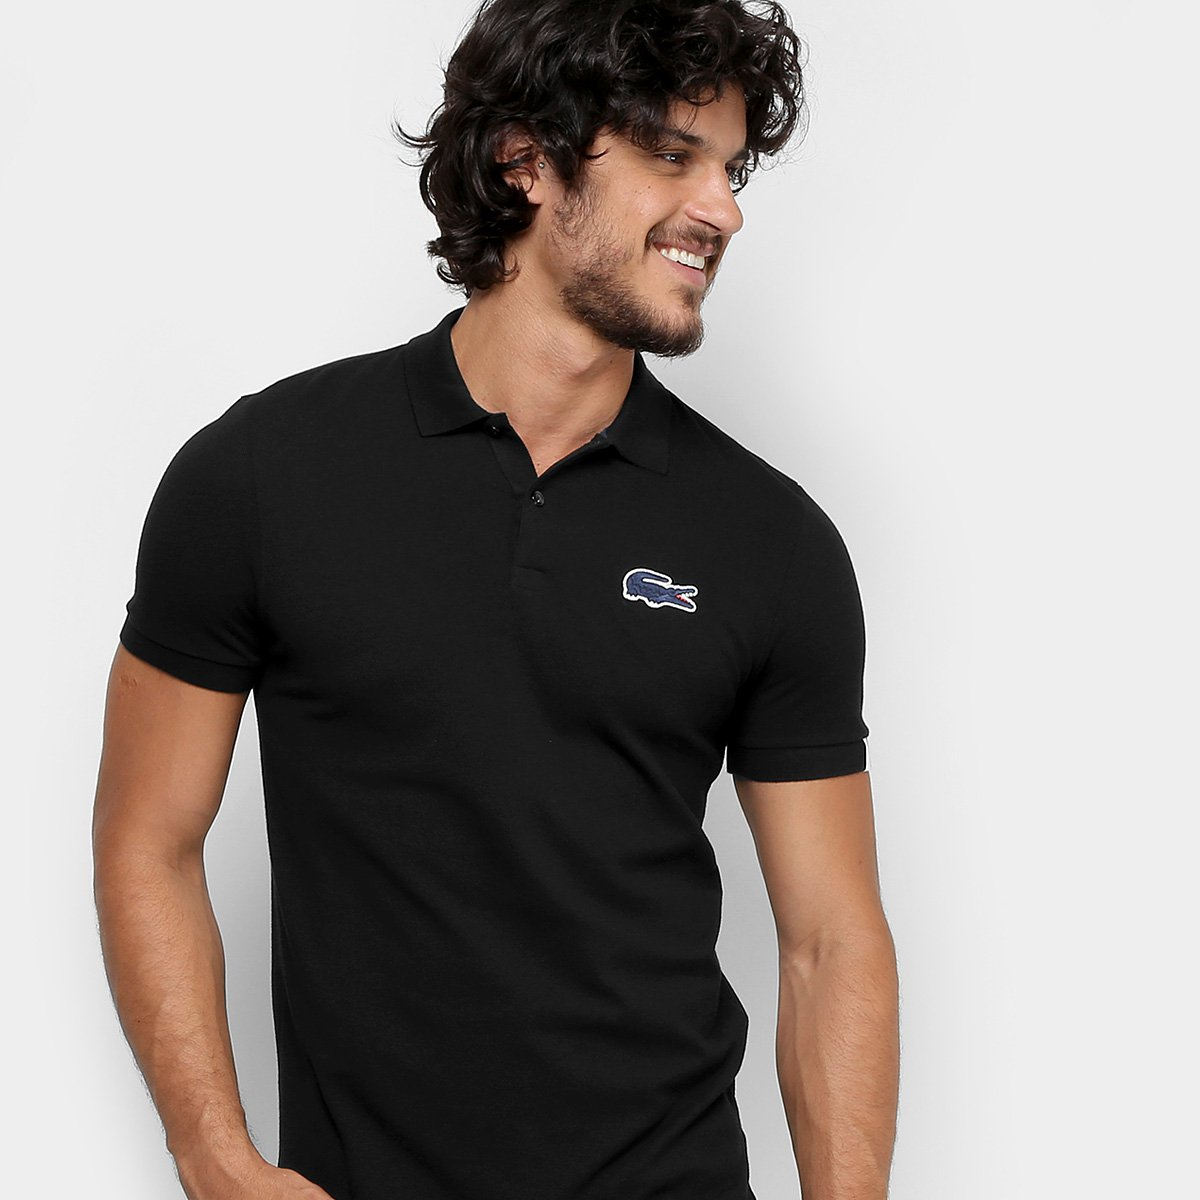 8e2f67e924239 Camisa Polo Lacoste Live Piquet Masculina - Compre Agora   Netshoes